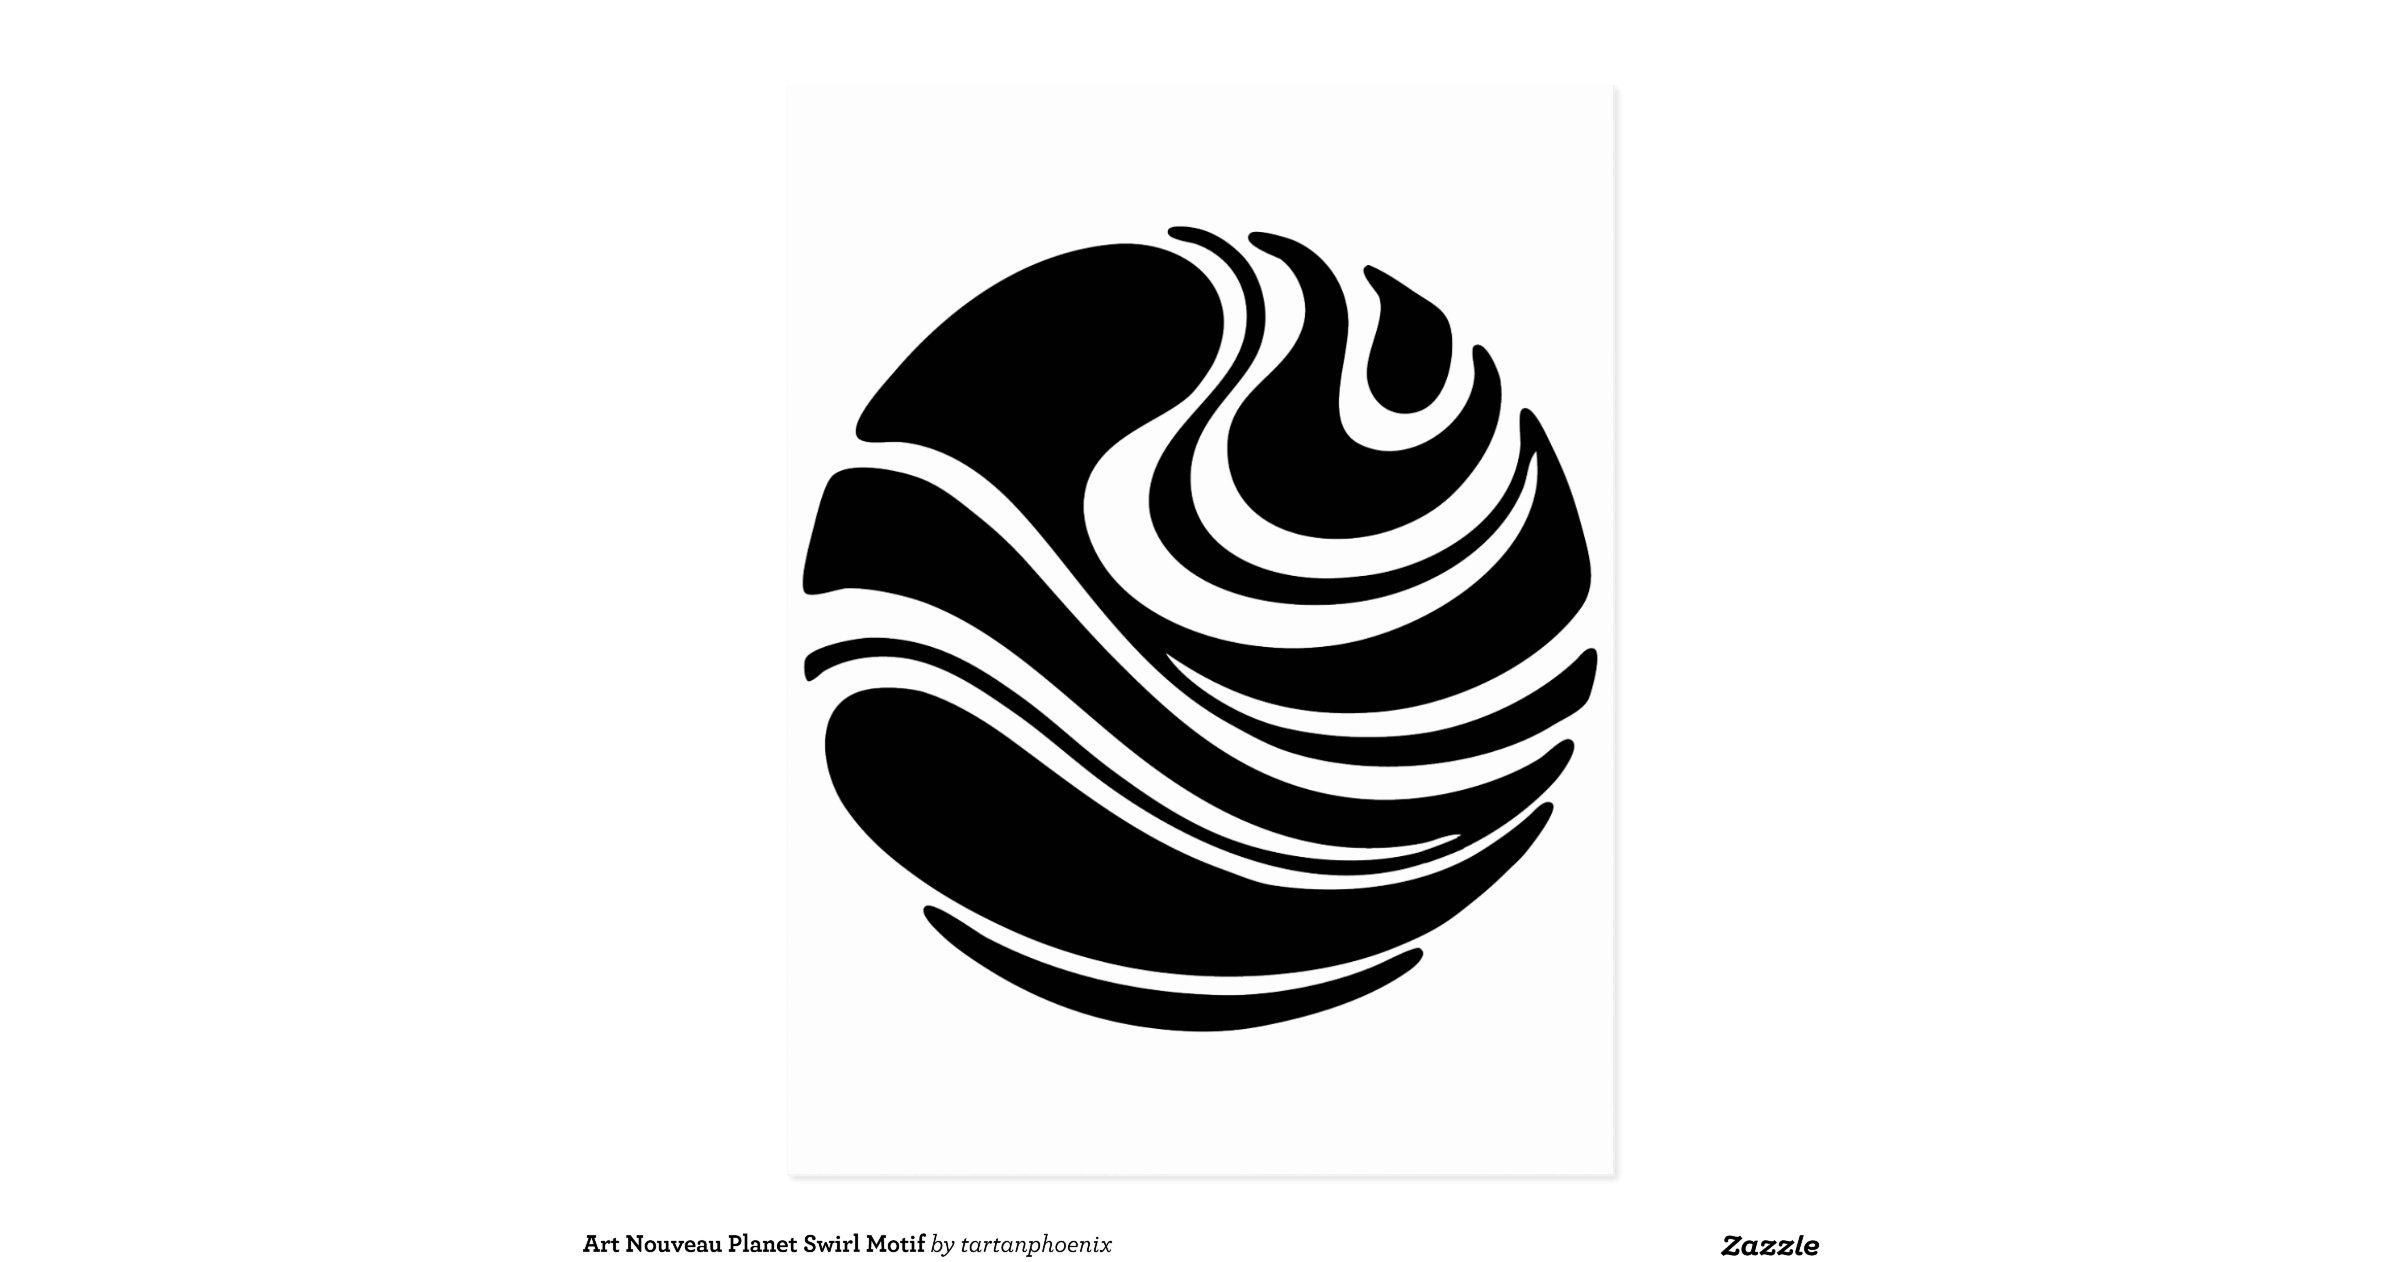 art nouveau planet swirl motif postcard r58eddbcc8db0404e833210be50905f37 vgbaq 8byvr. Black Bedroom Furniture Sets. Home Design Ideas